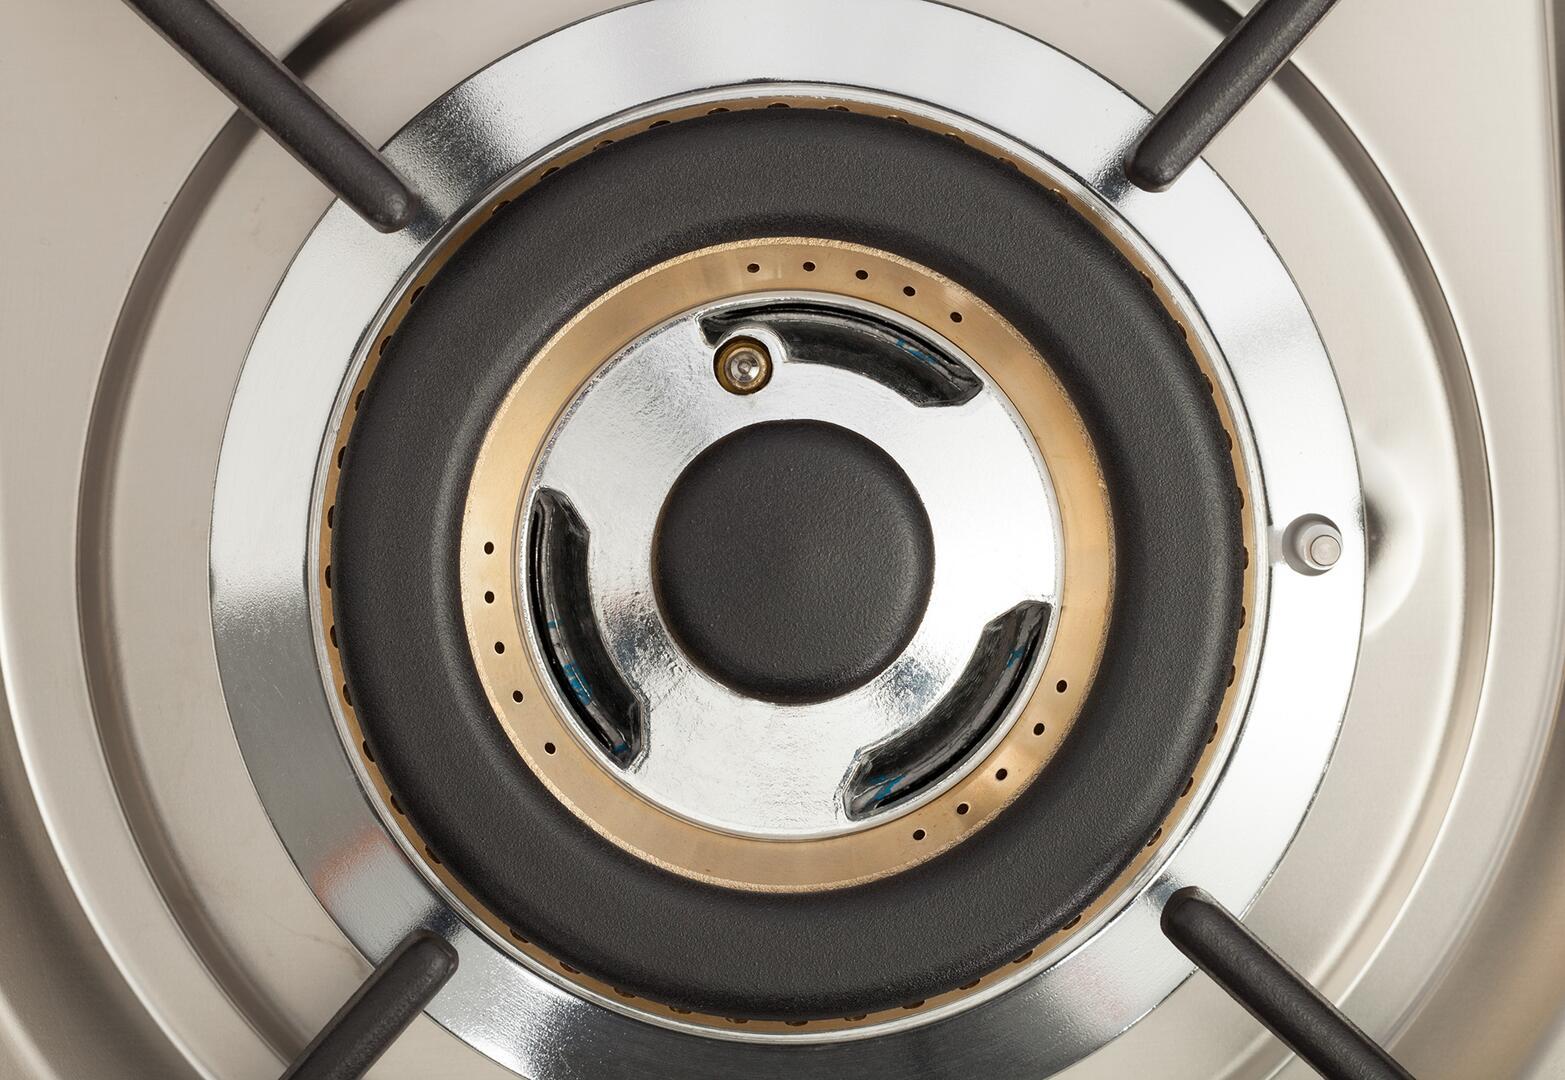 Ilve Nostalgie UPDN100FDMPNLP Freestanding Dual Fuel Range Black, 18